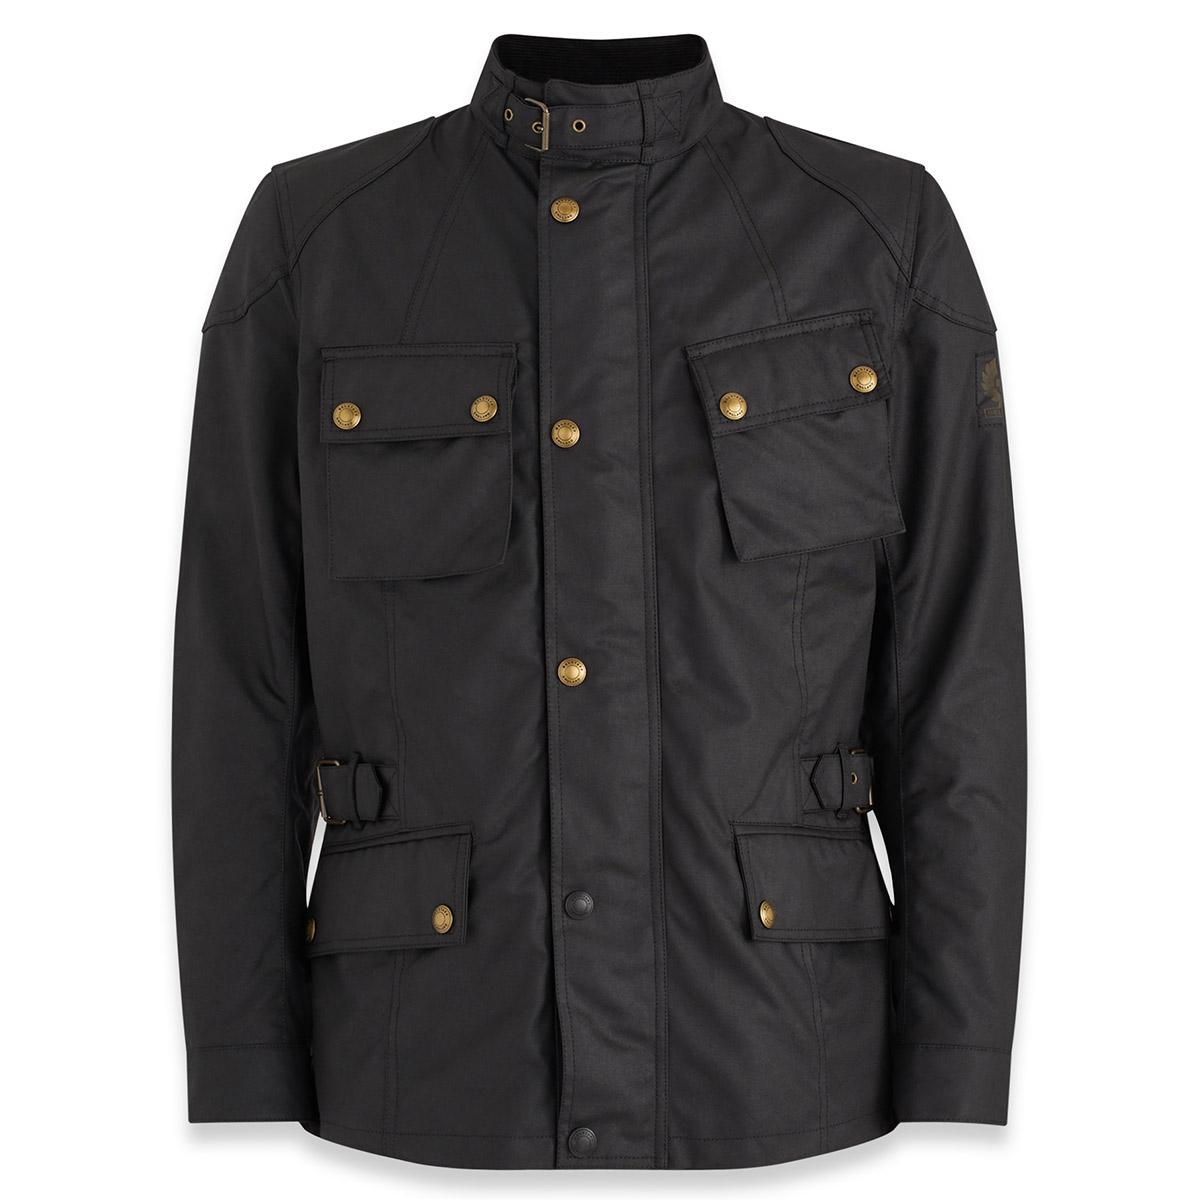 Belstaff Crosby Waxed Cotton Jacket - Black